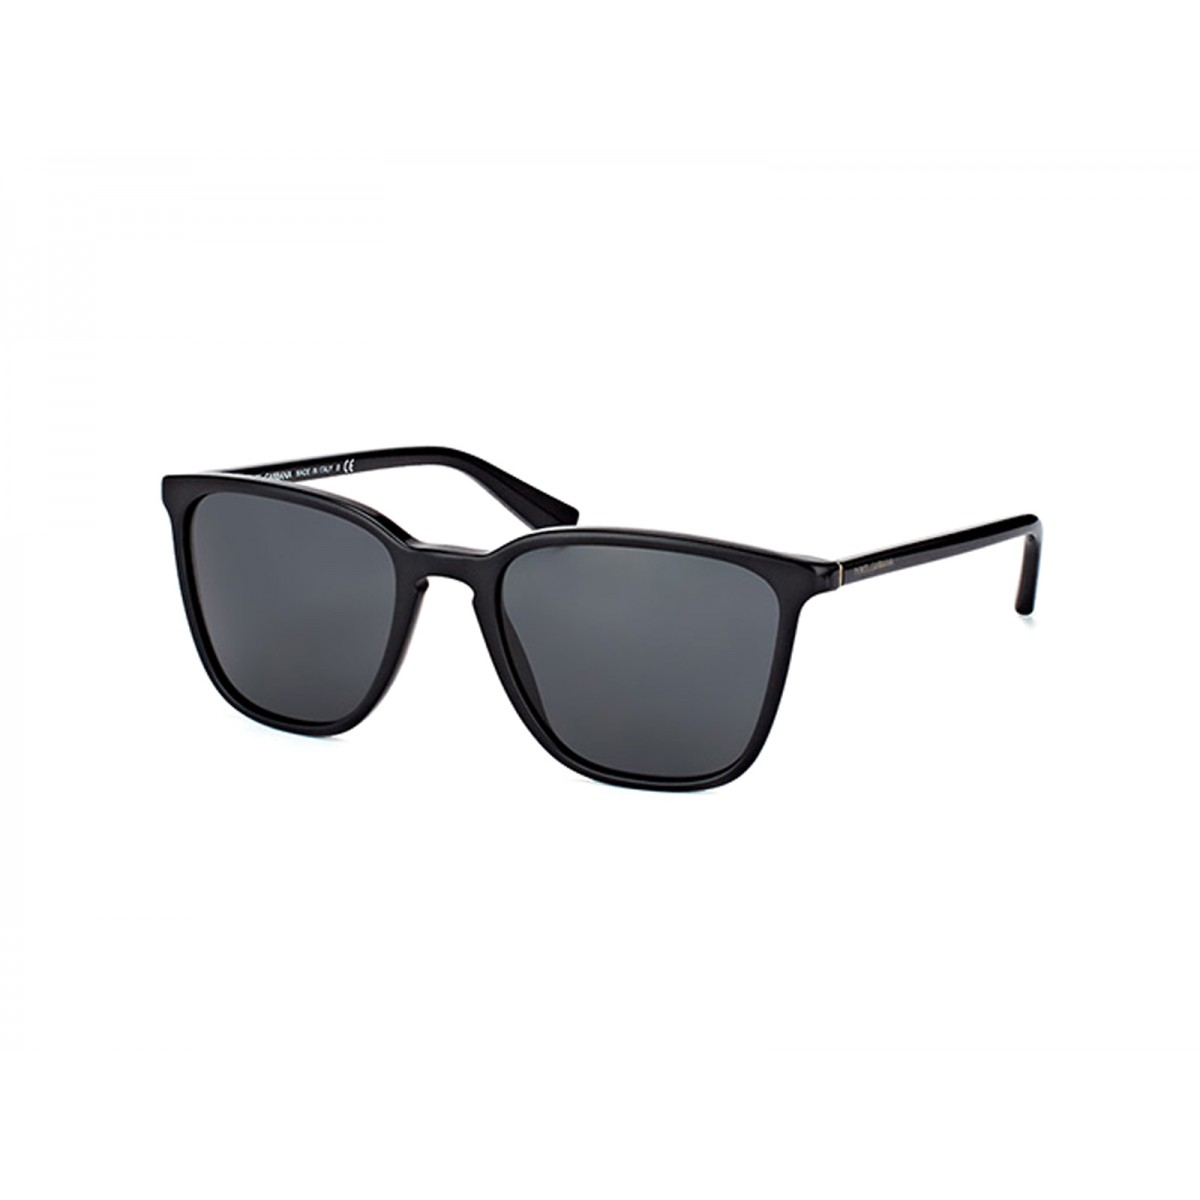 cc6b6d207280 Dolce   Gabbana Havana Square Acetate Men Sunglasses DG4301-502 73 ...